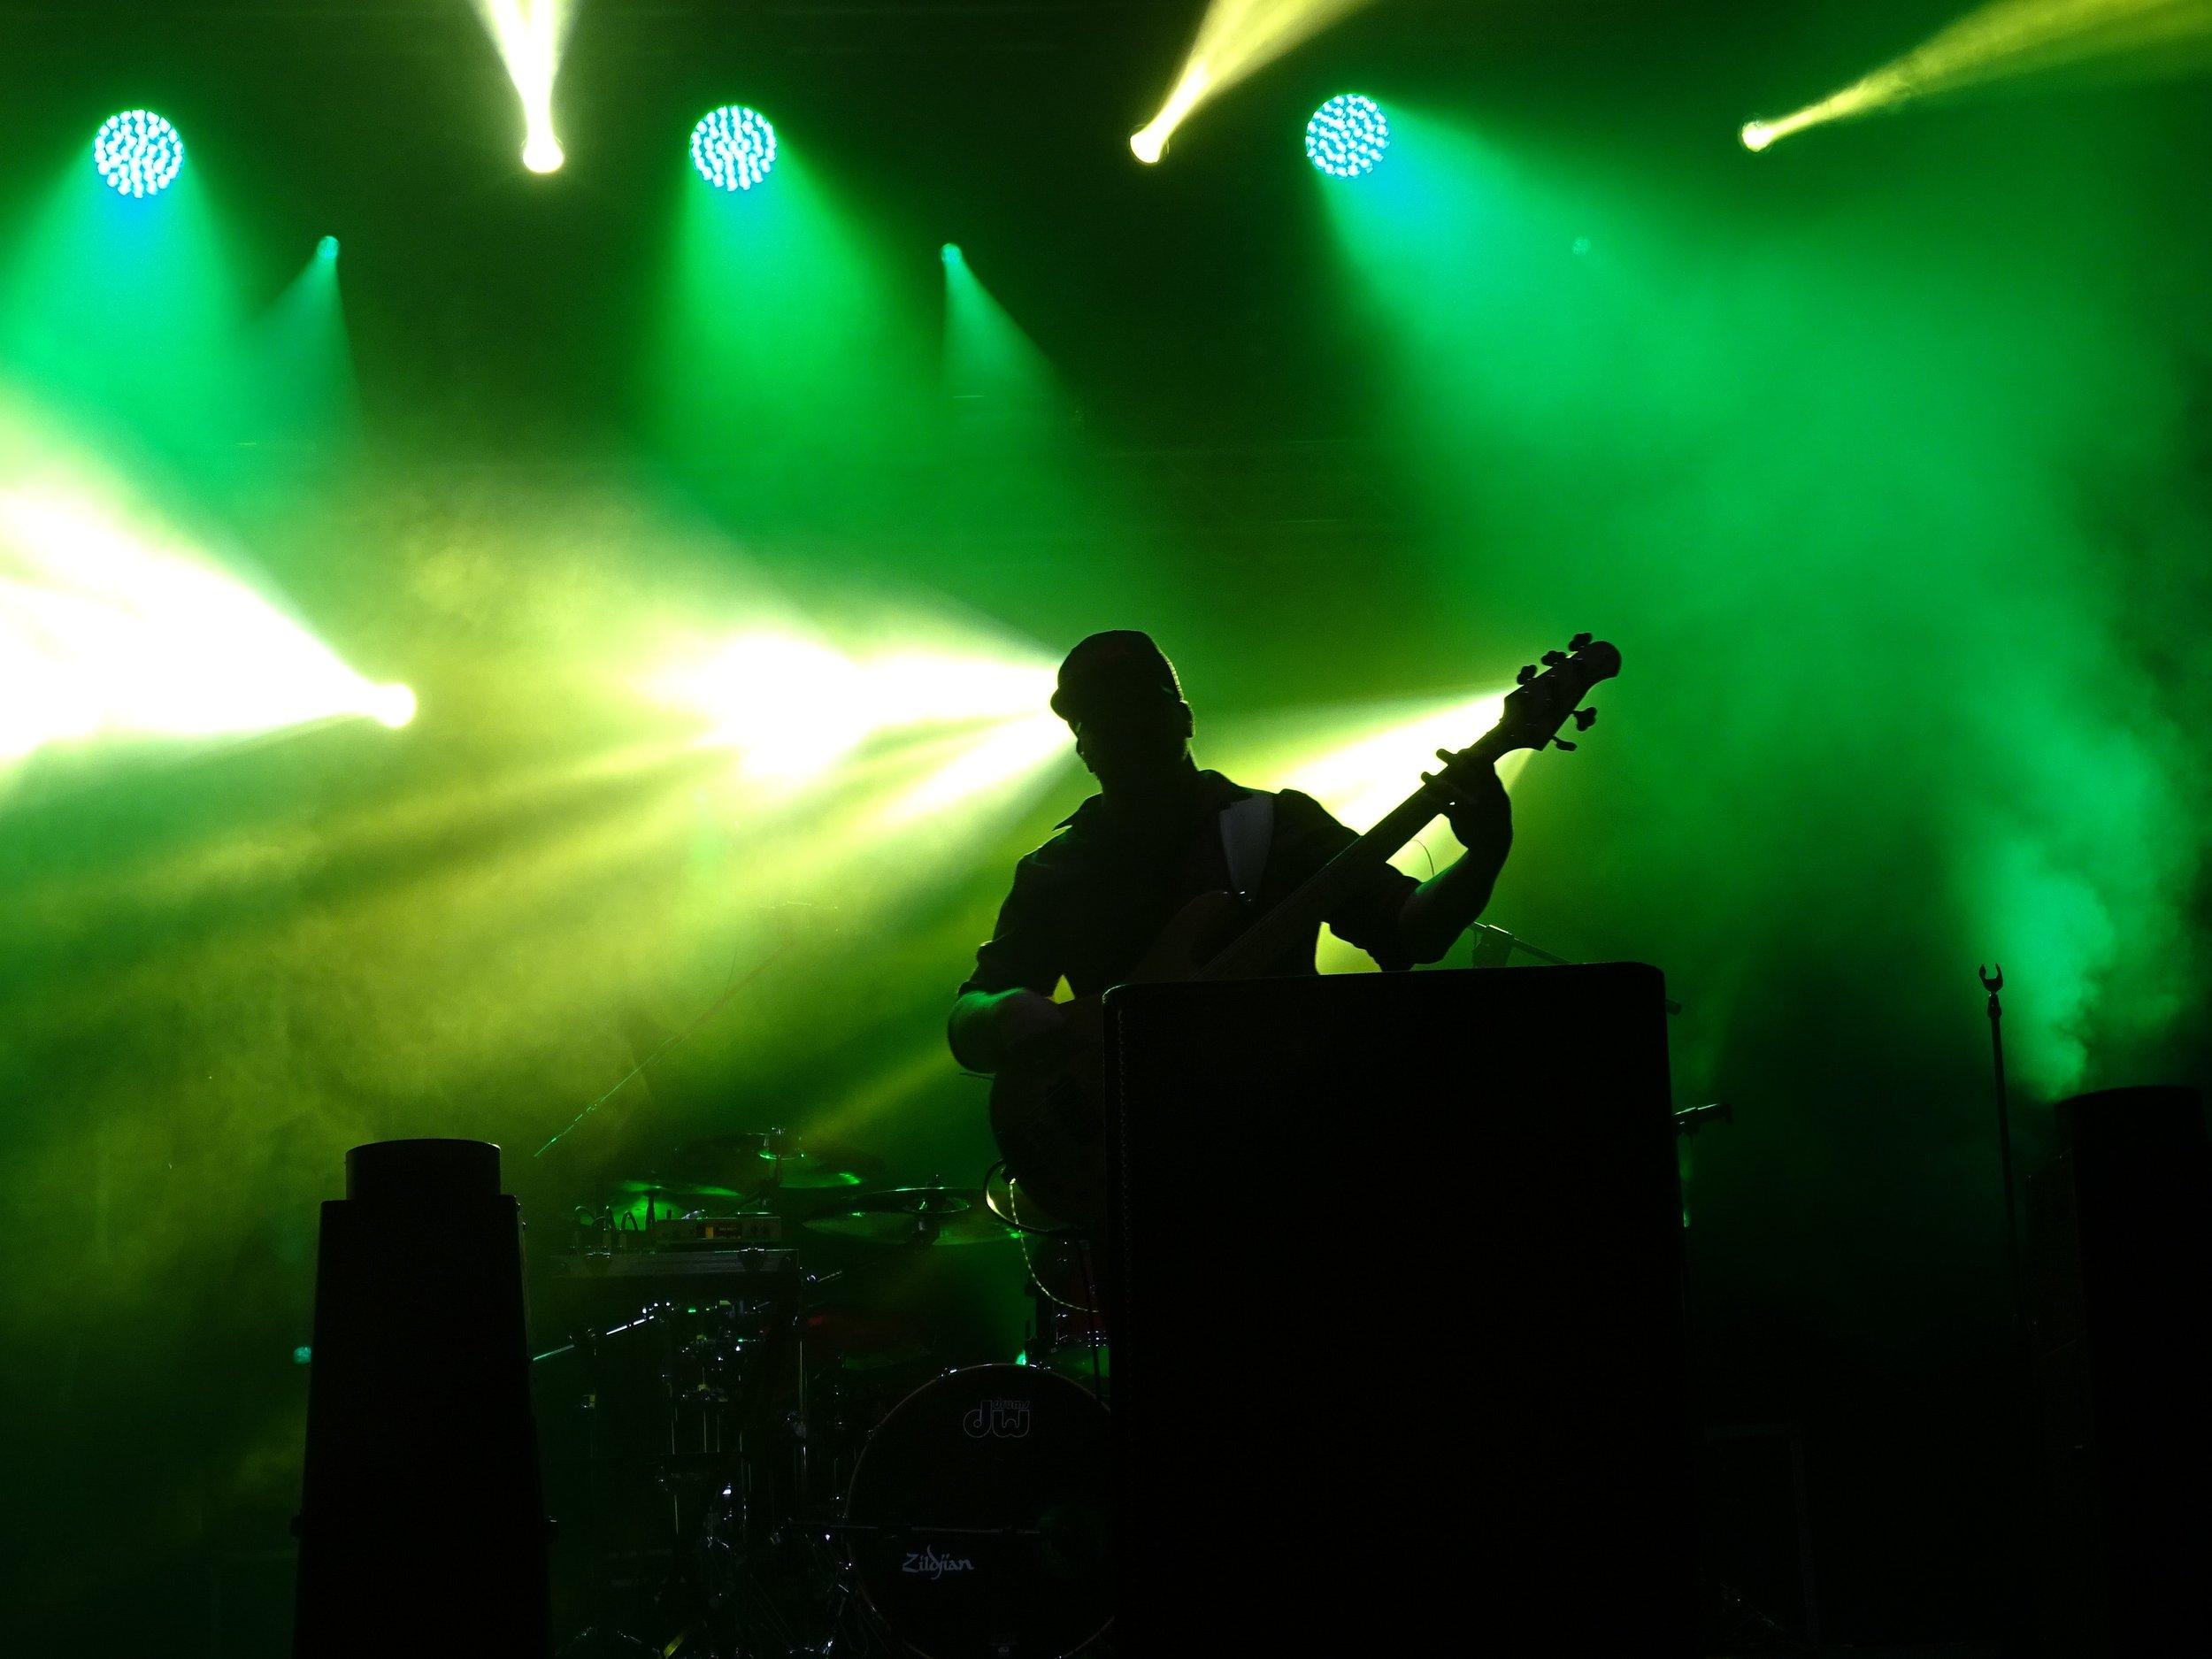 backlit-band-bass-guitar-417475.jpg